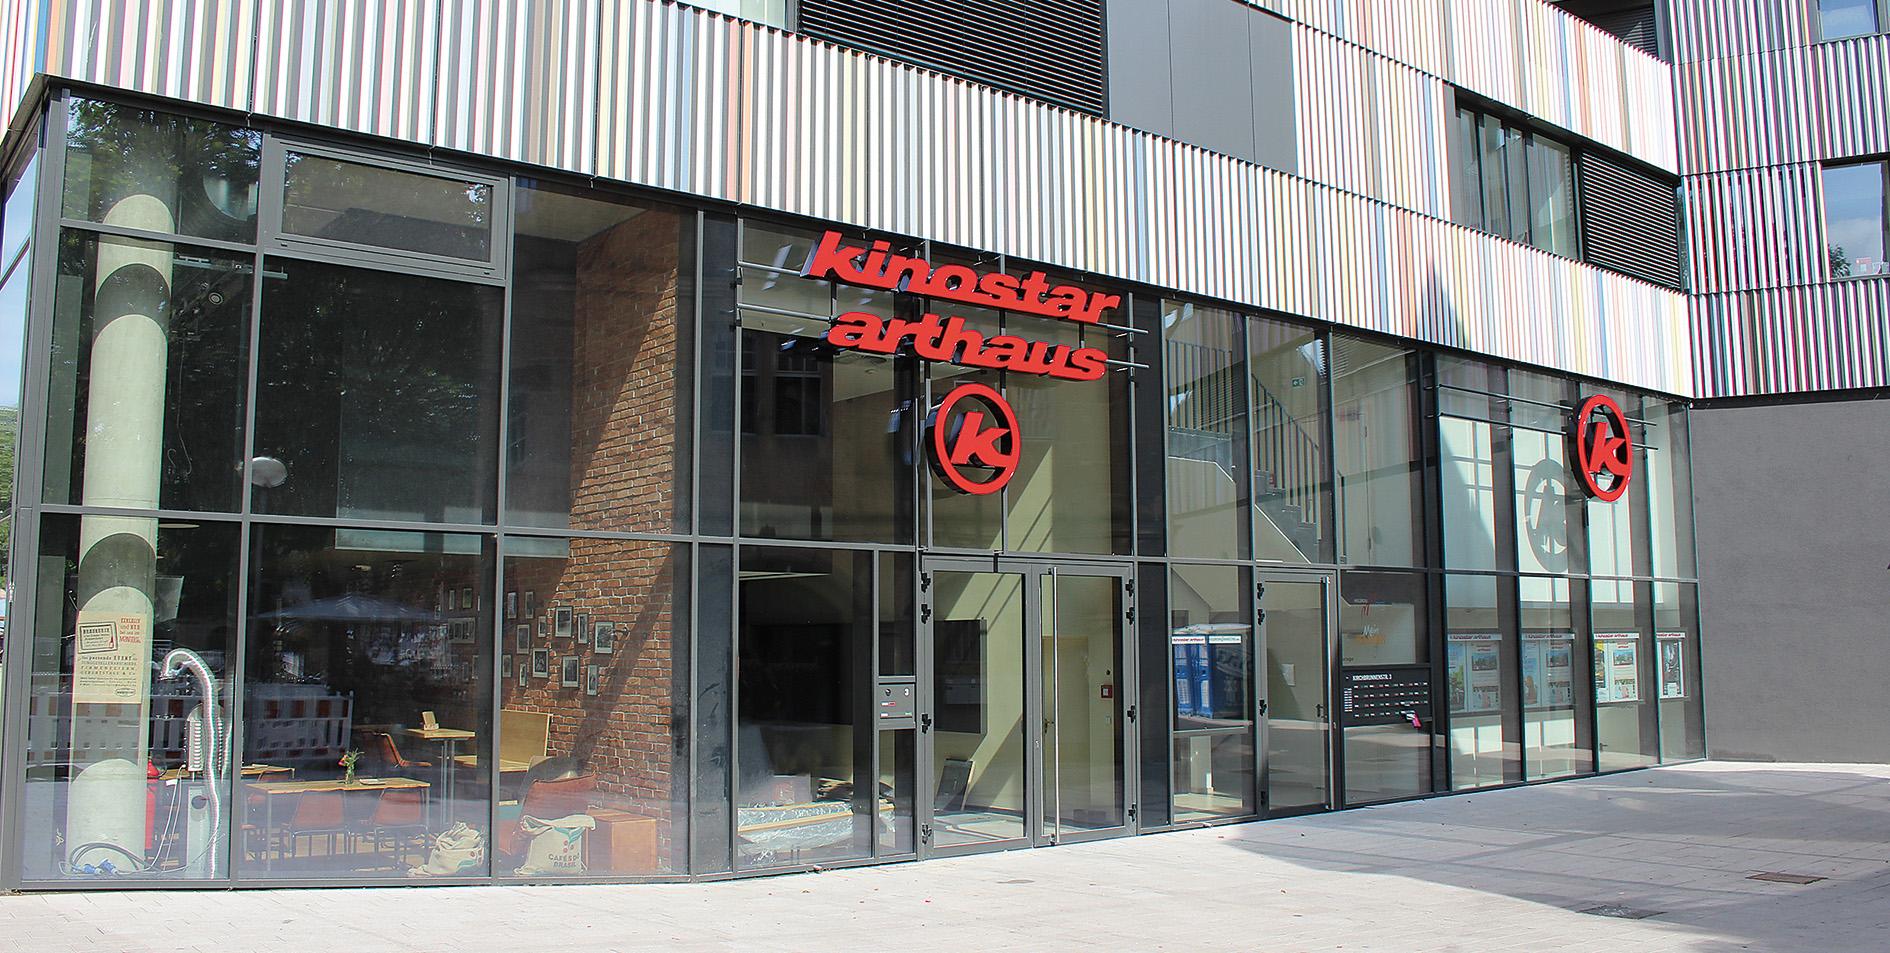 Kinostar Arthaus